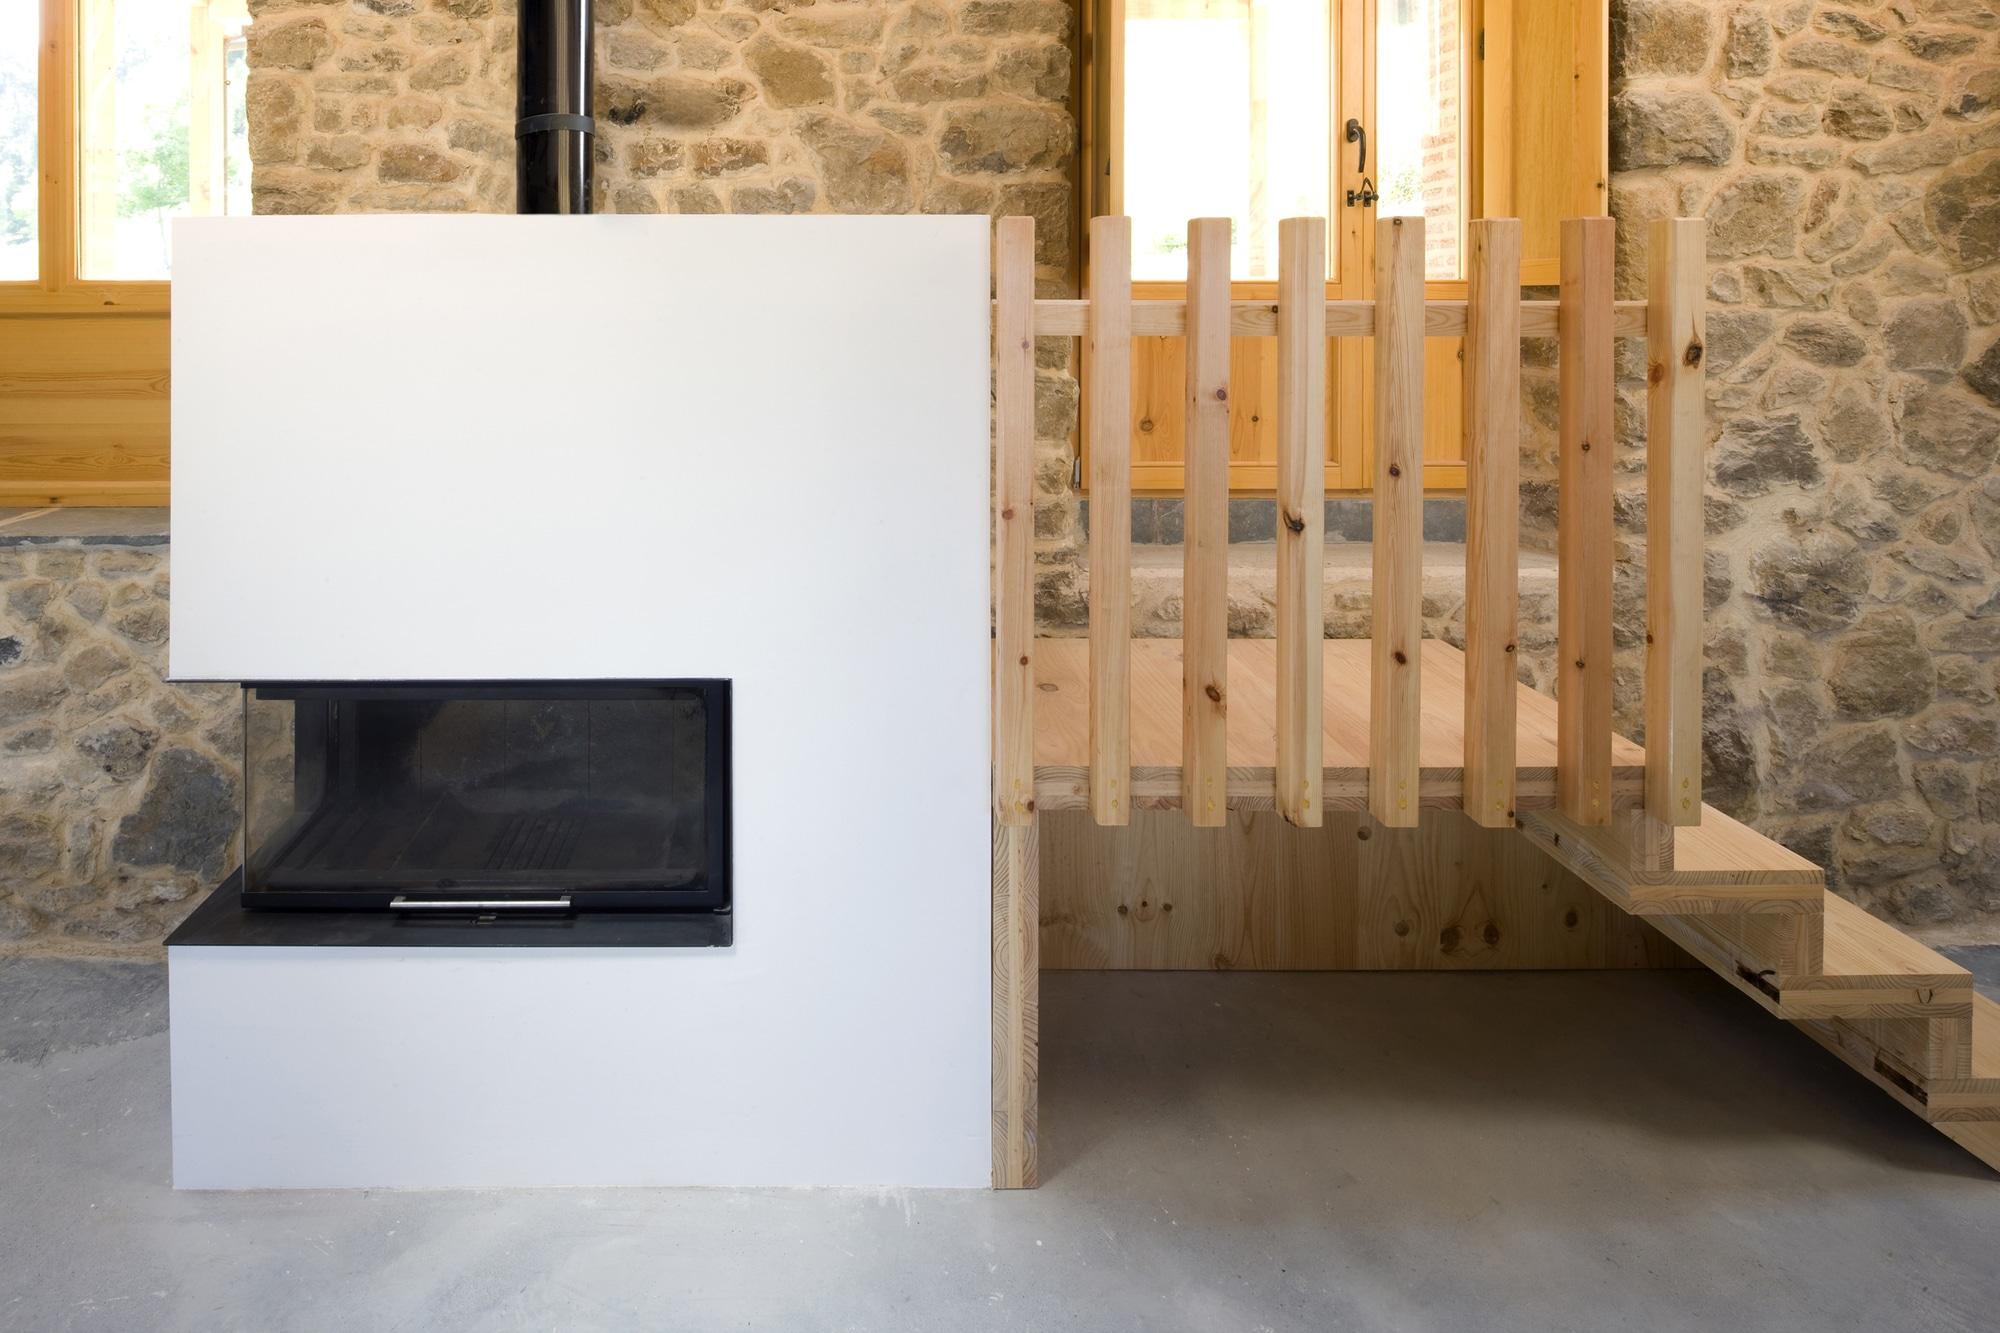 Dise o de casa r stica de piedra planos construye hogar - Casas rurales de diseno ...